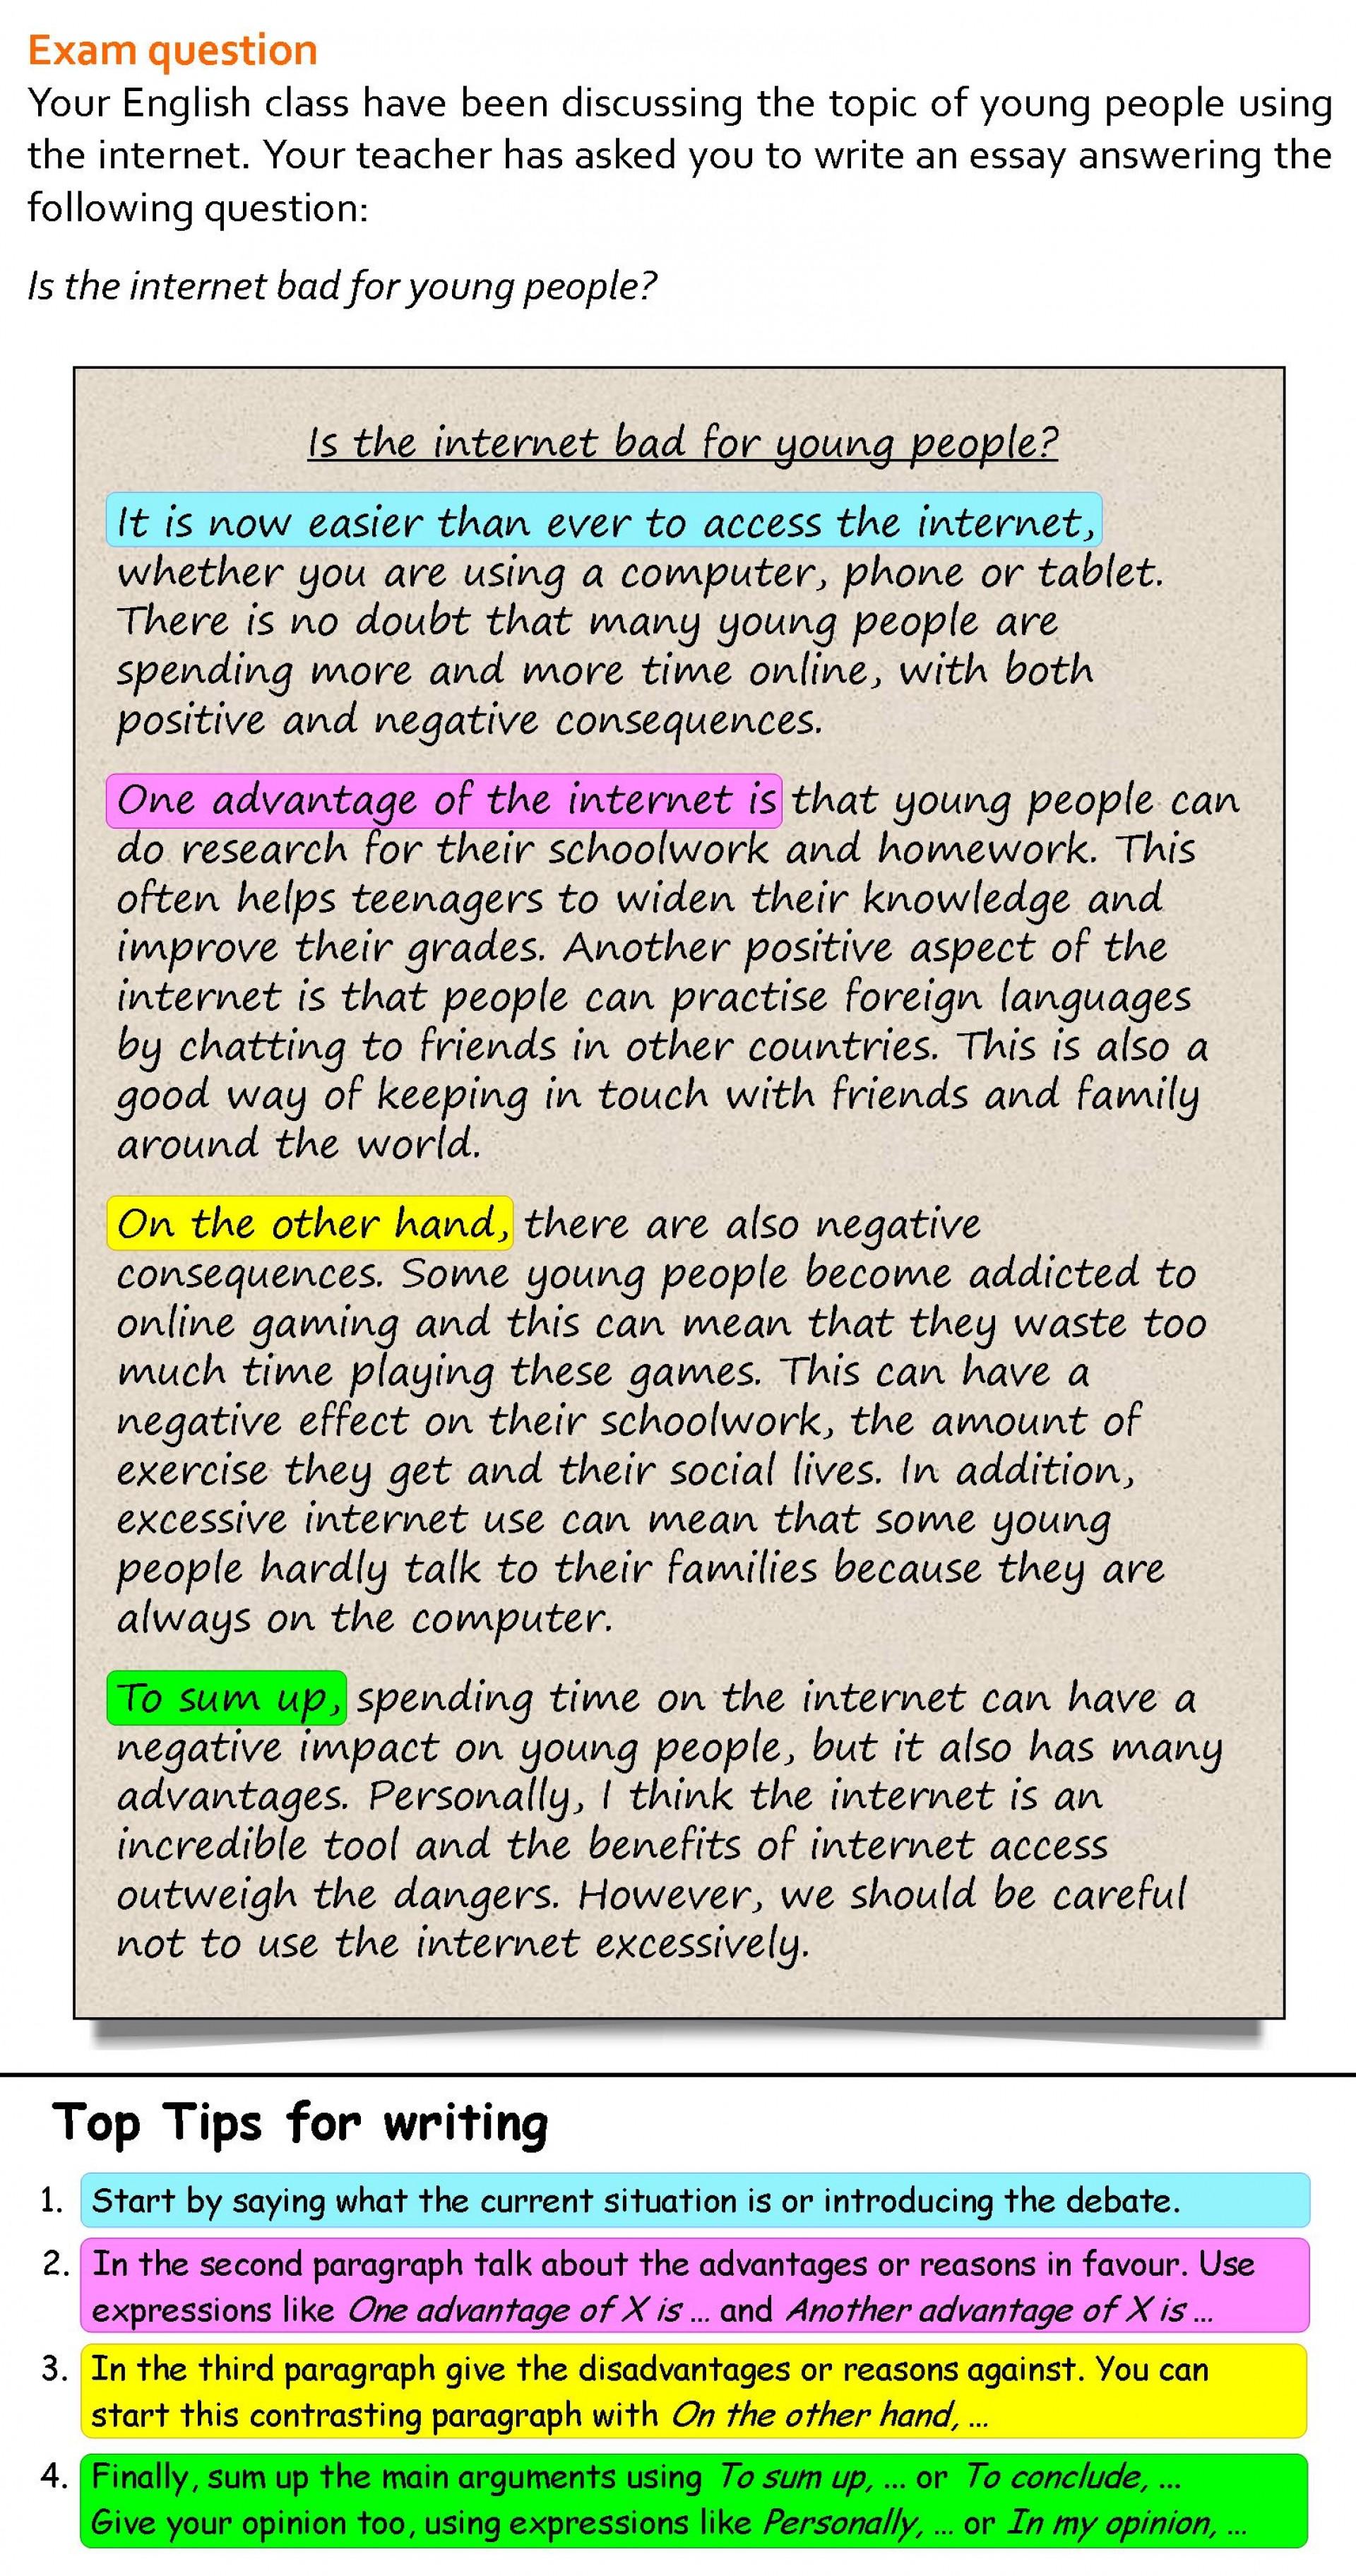 011 B2w A For And Against Essay 0 Internet Addiction Dreaded In Hindi Urdu 200 Words 1920